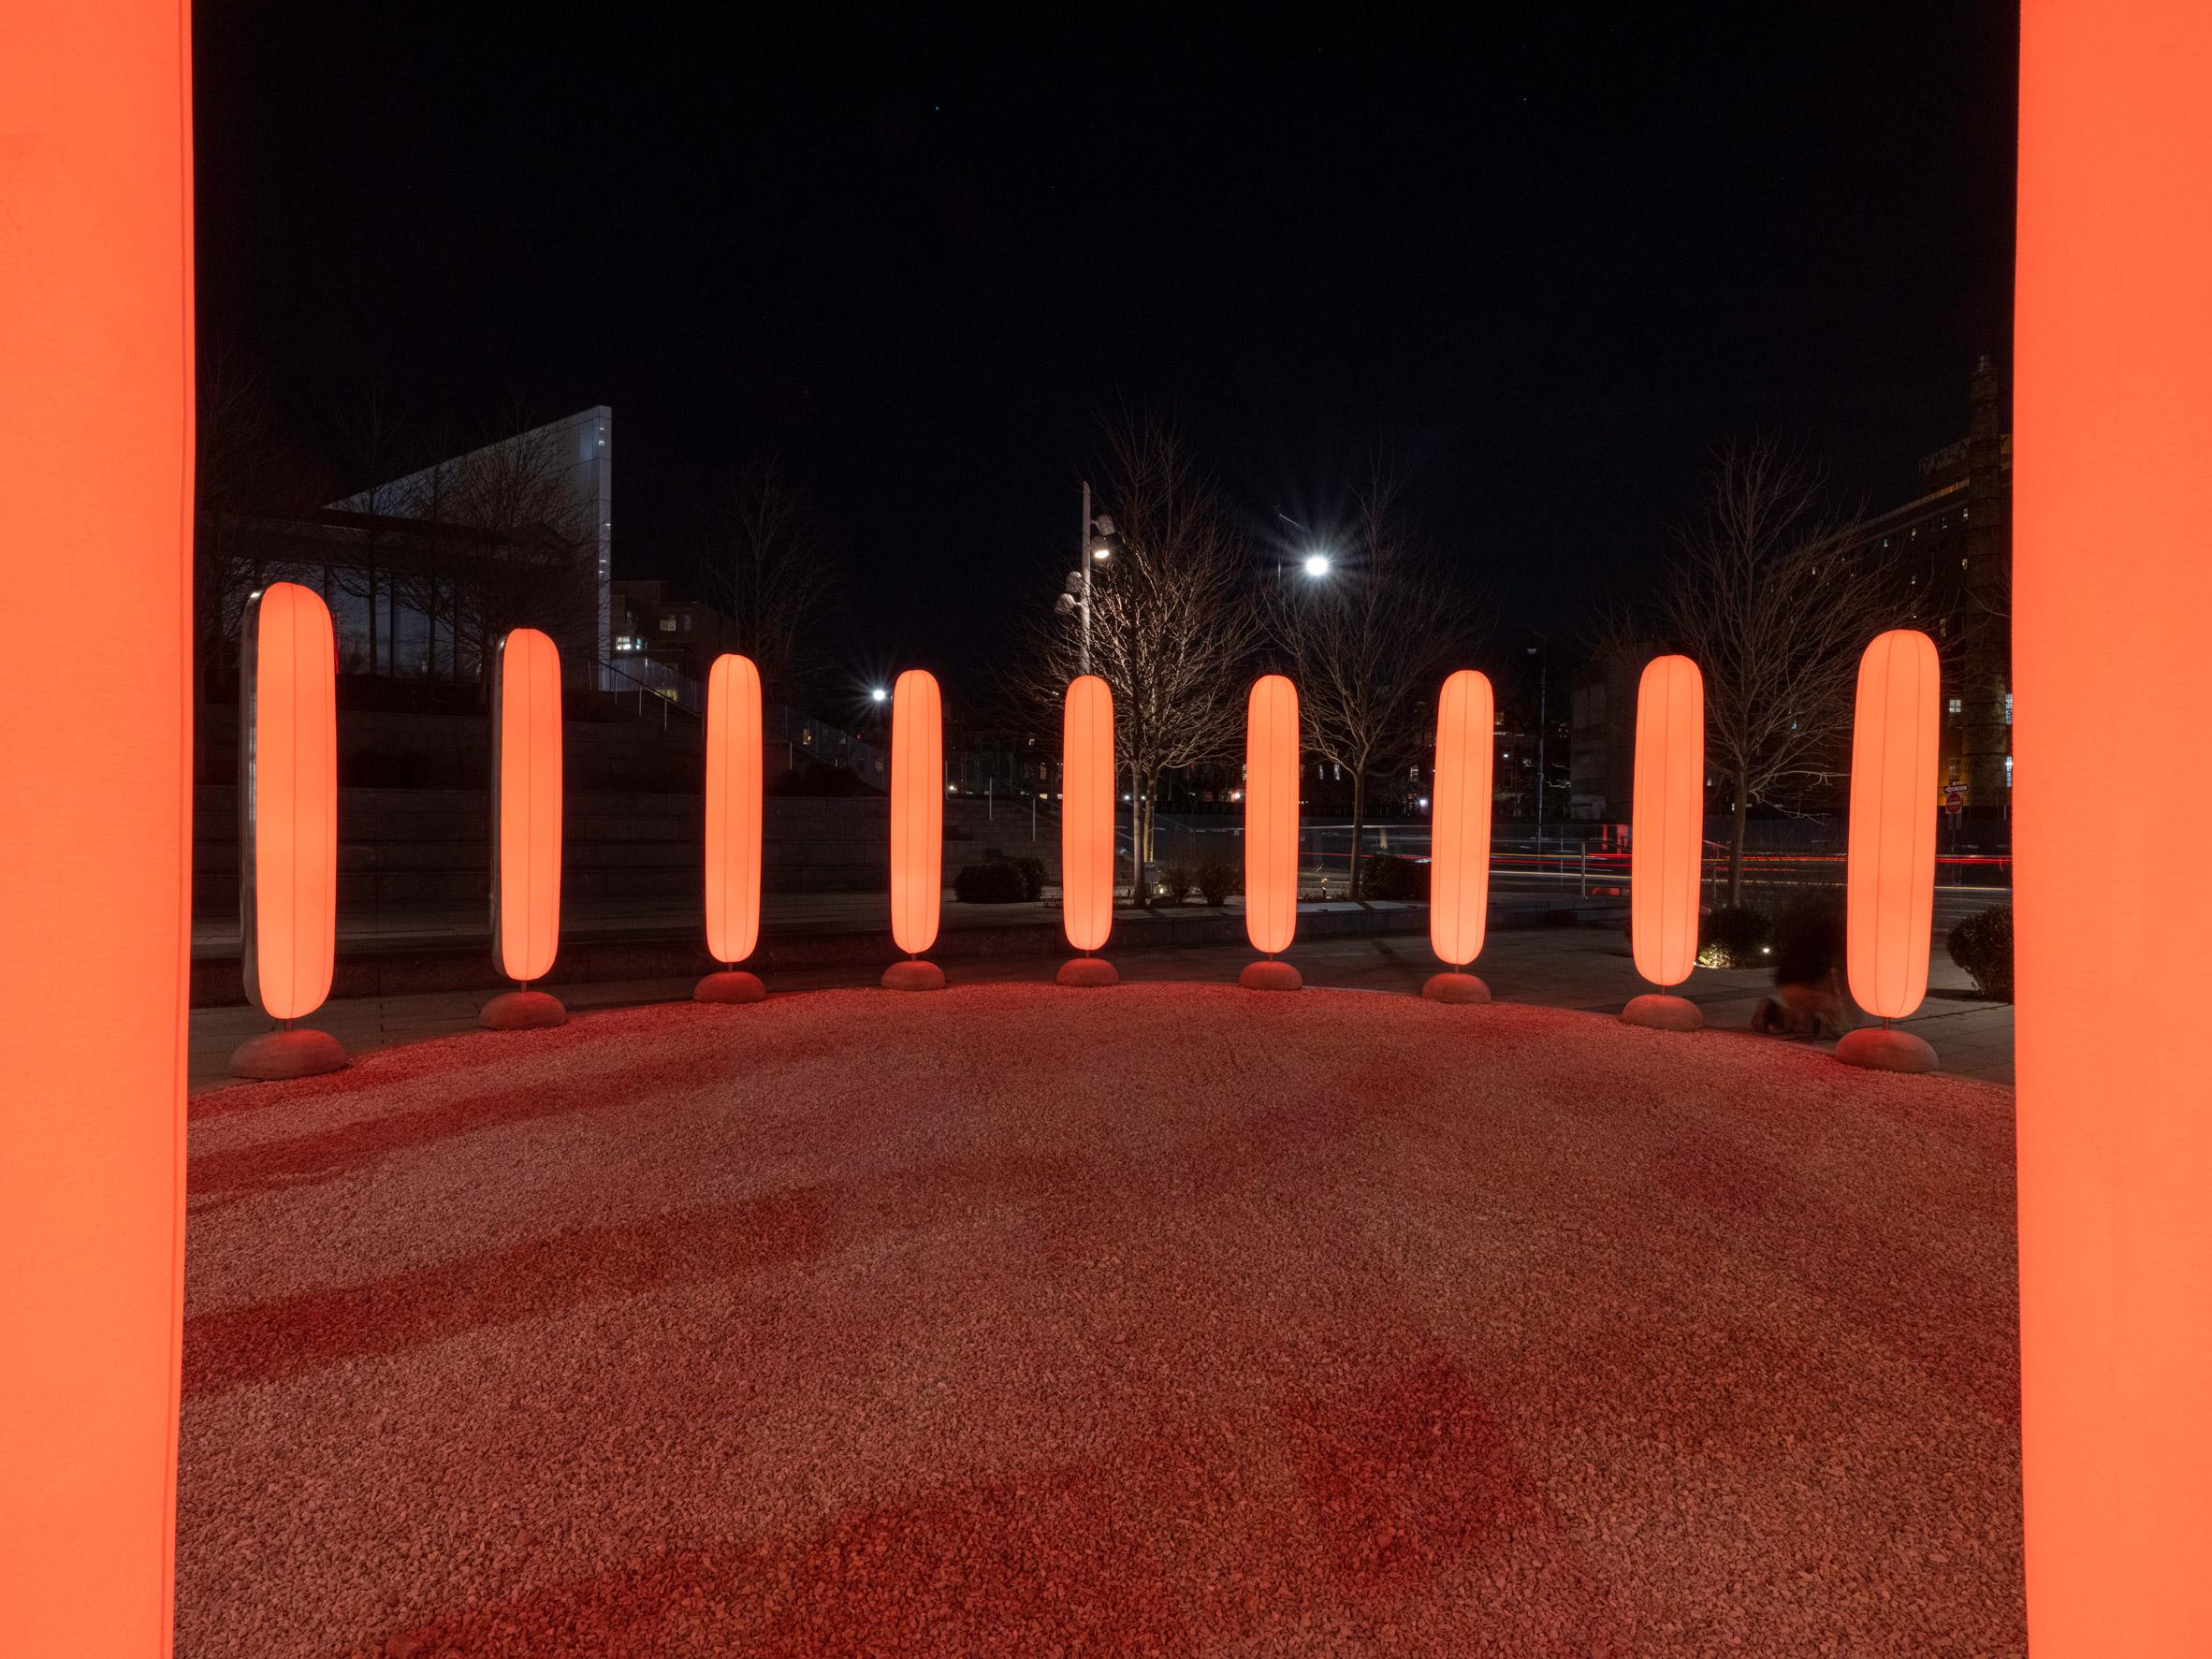 Ekene Ijeoma made the pillars glow orange to reflect the colour of the sun